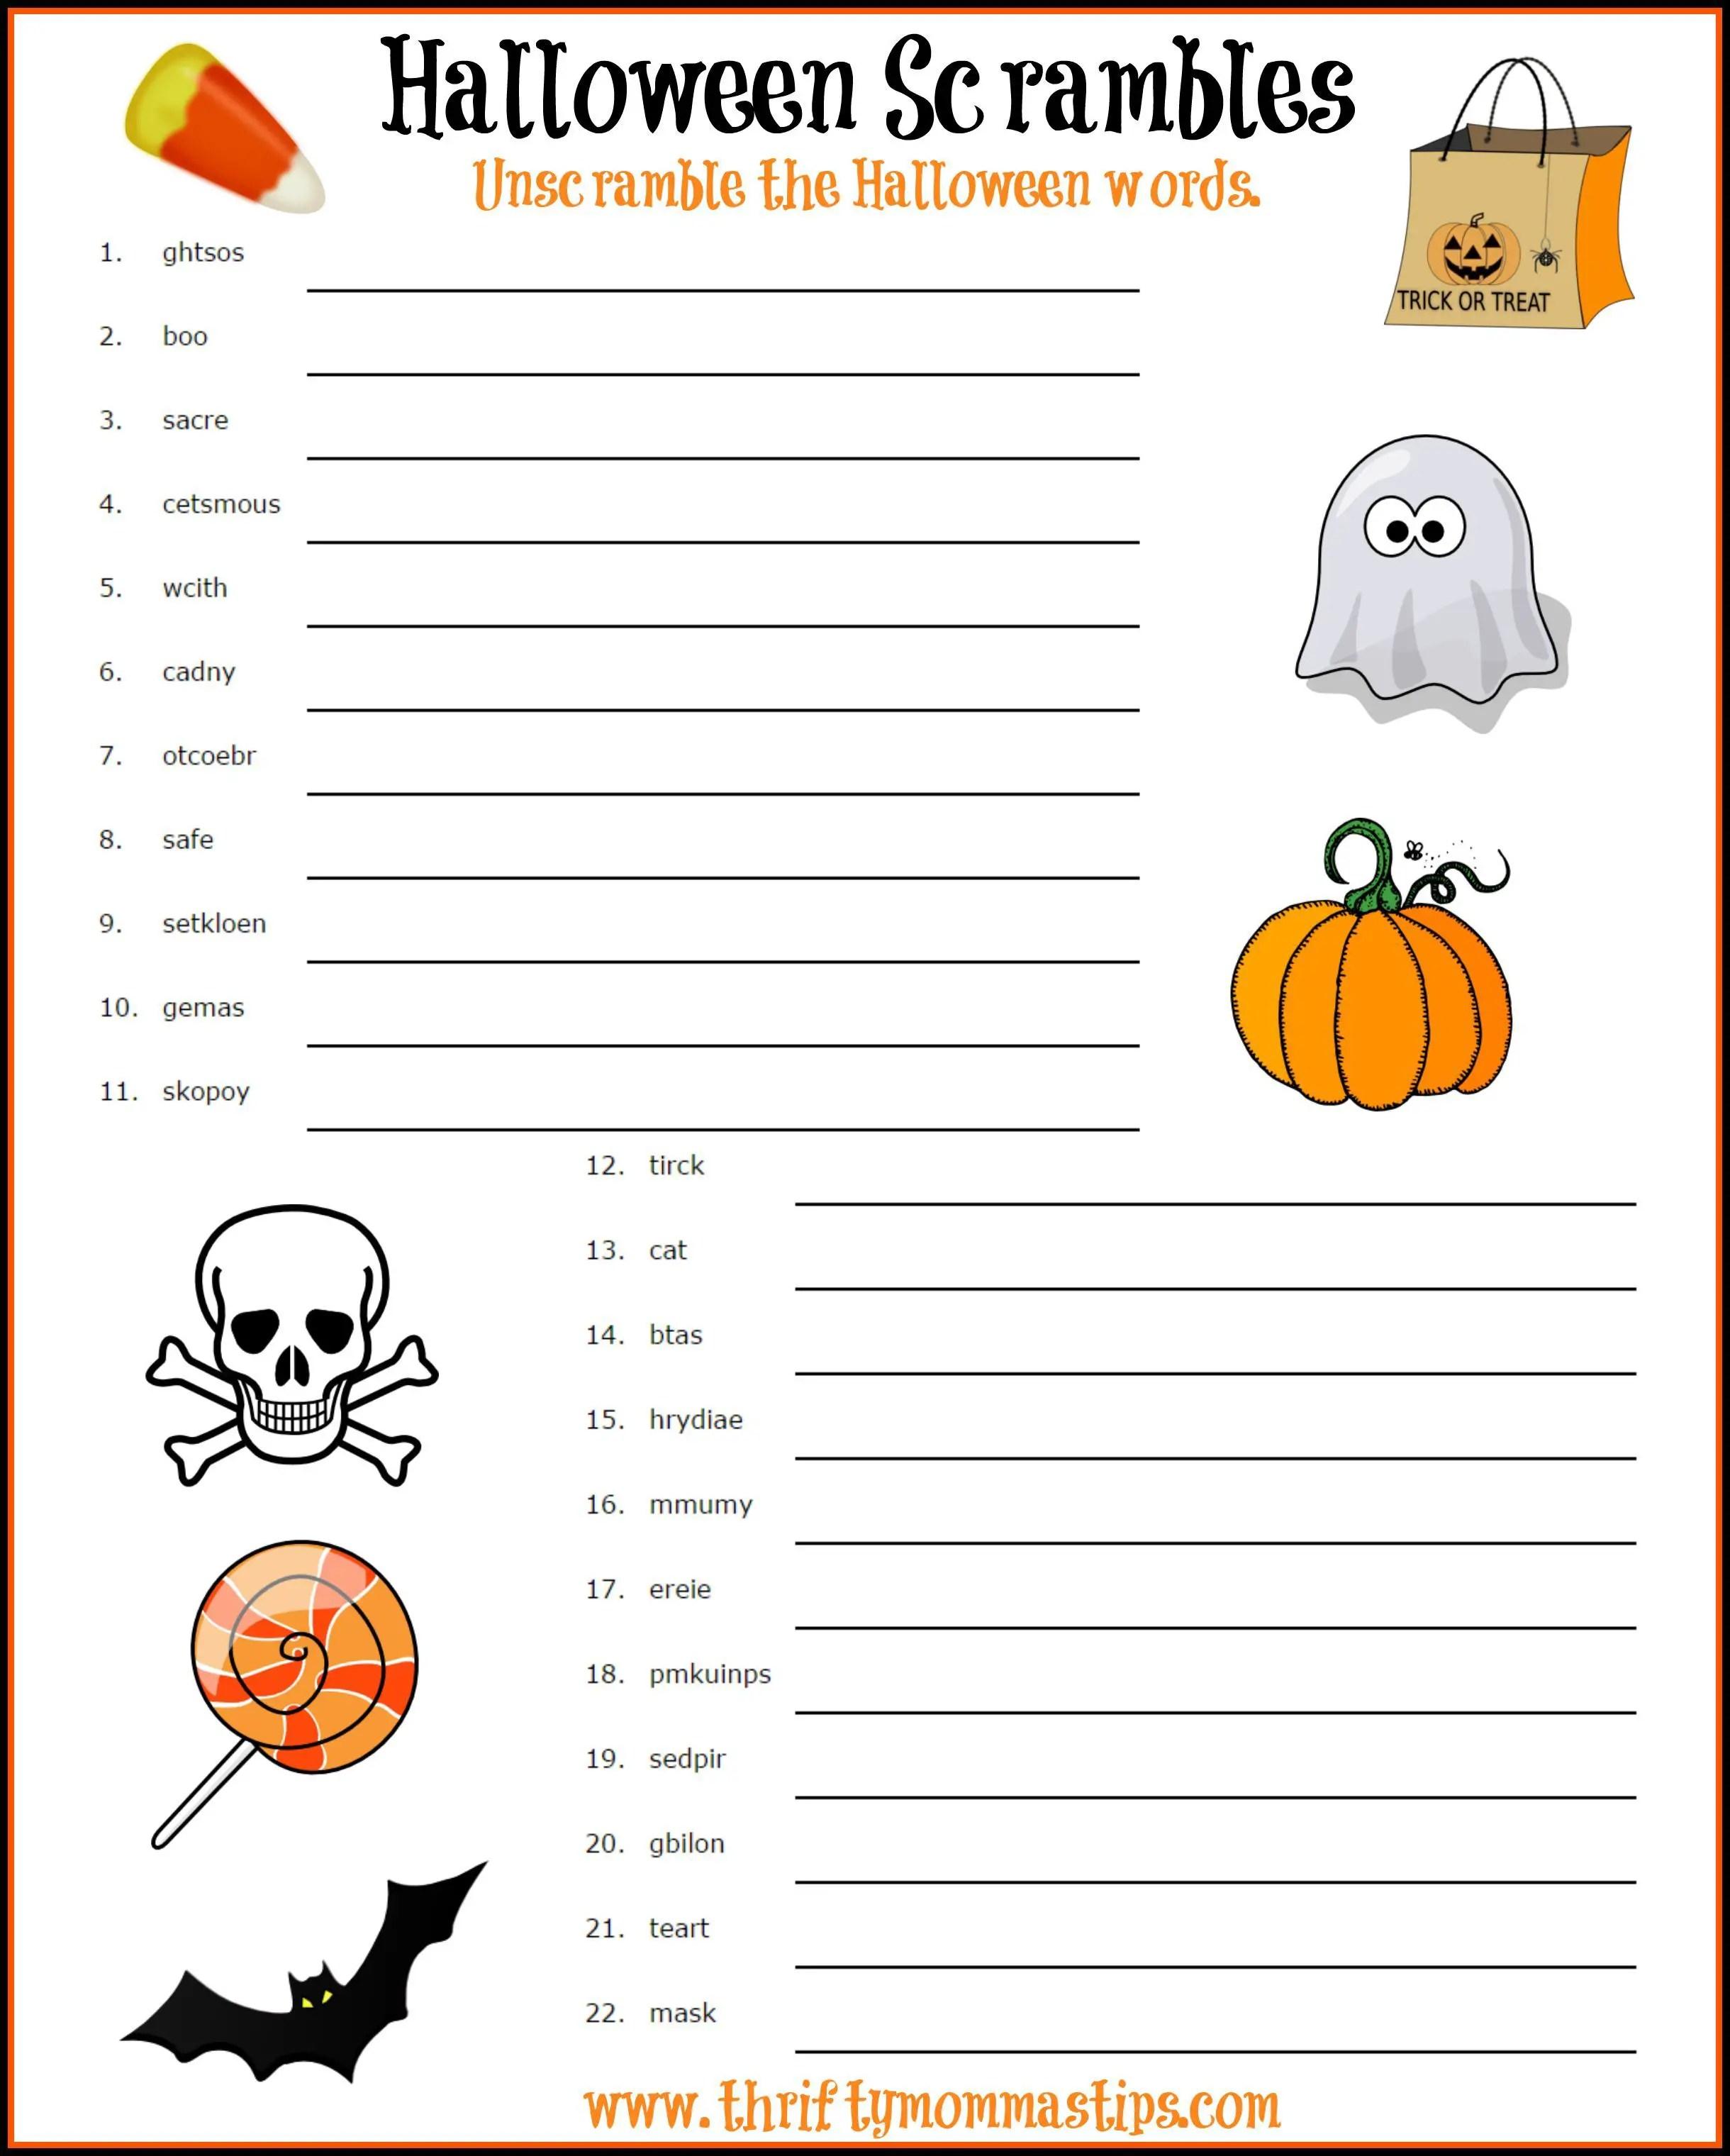 20 Spooky Halloween Word Scrambles